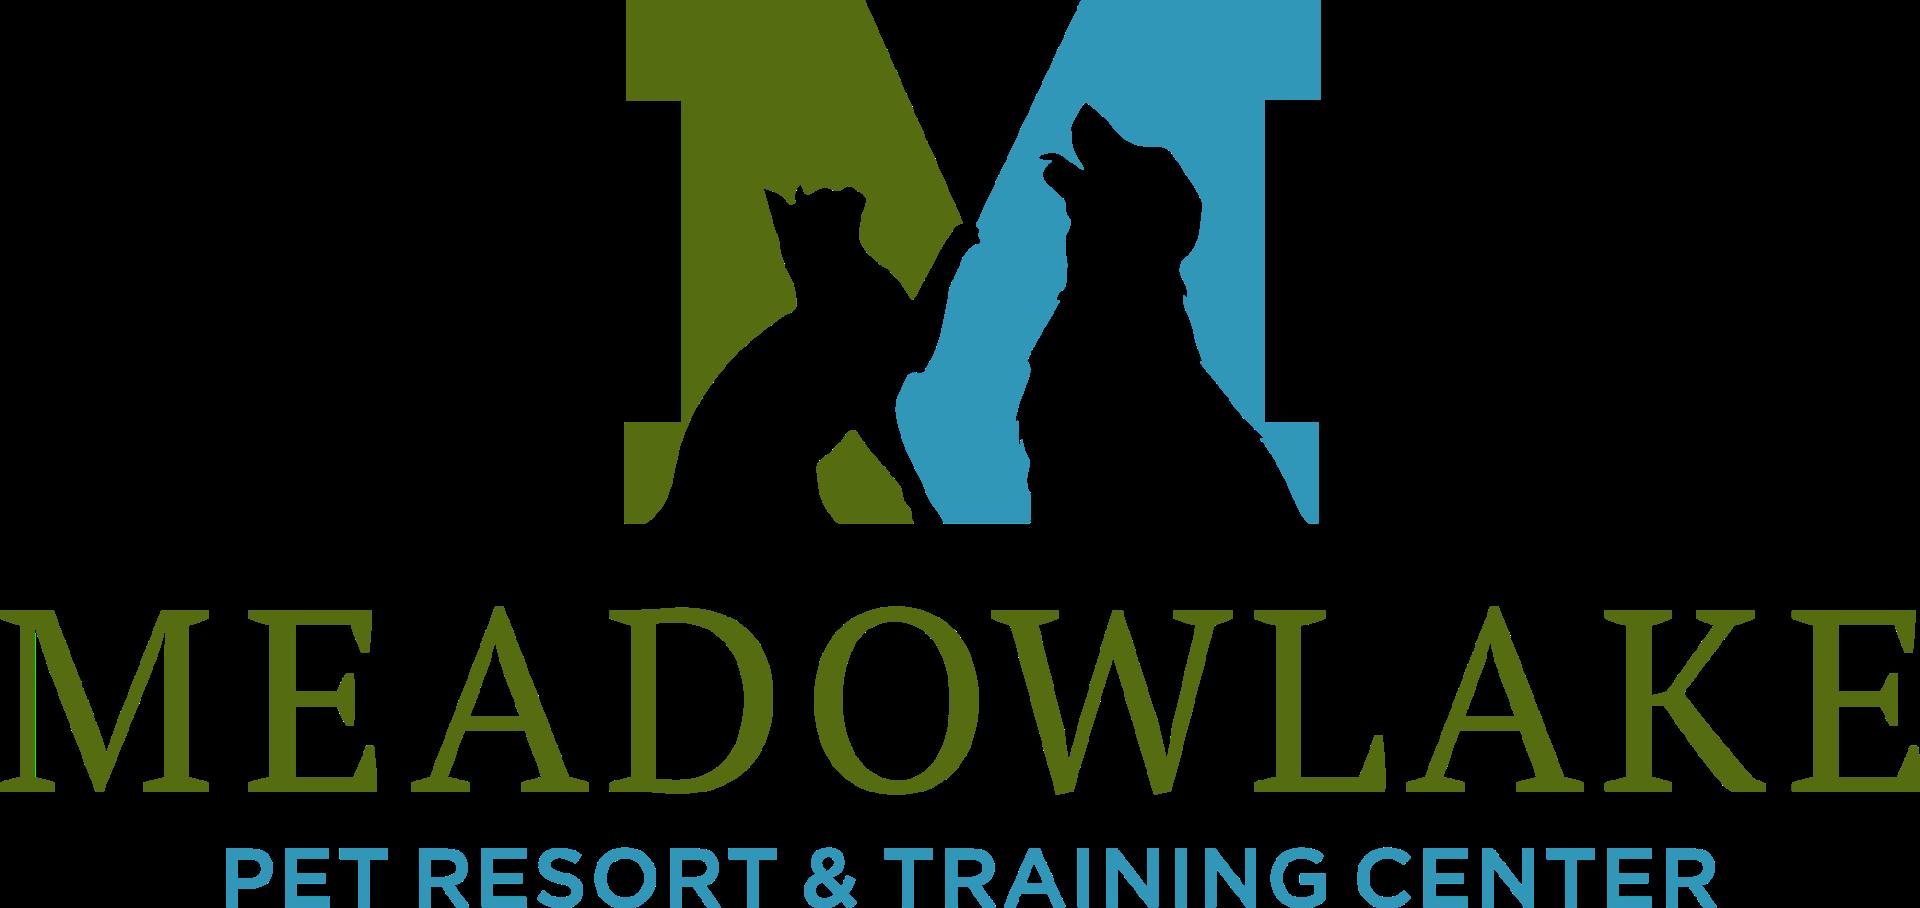 meadowlake_logo